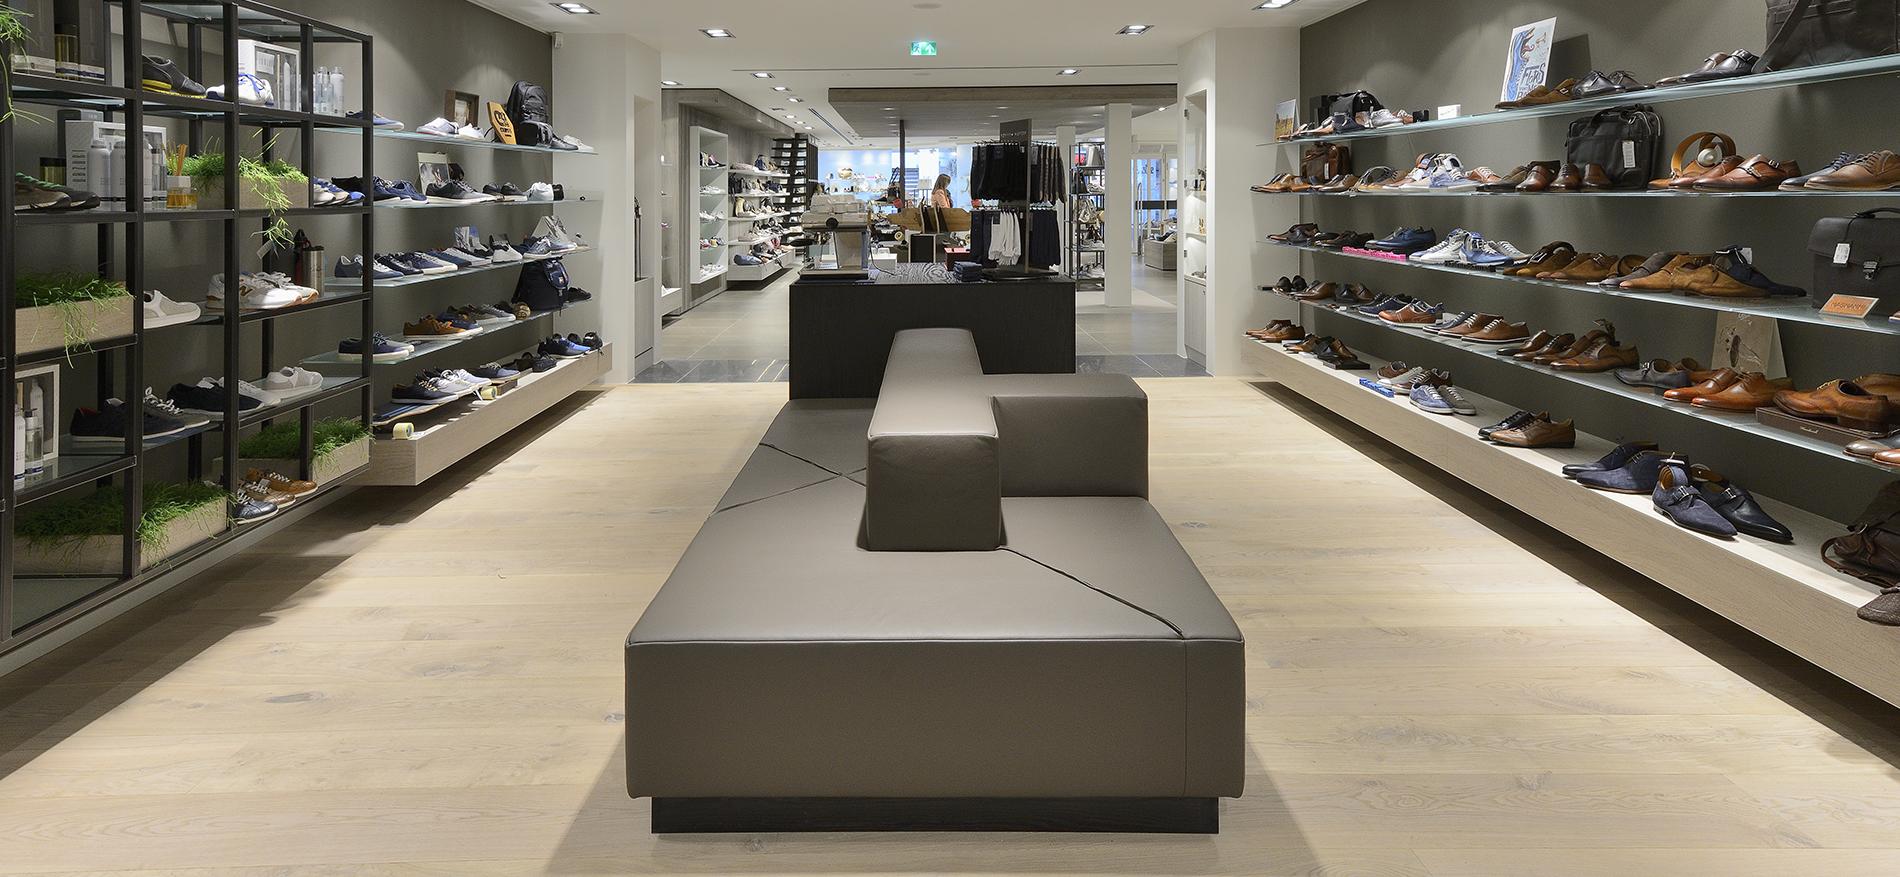 konzept store f r shuz einrichtung schuhgesch ft. Black Bedroom Furniture Sets. Home Design Ideas